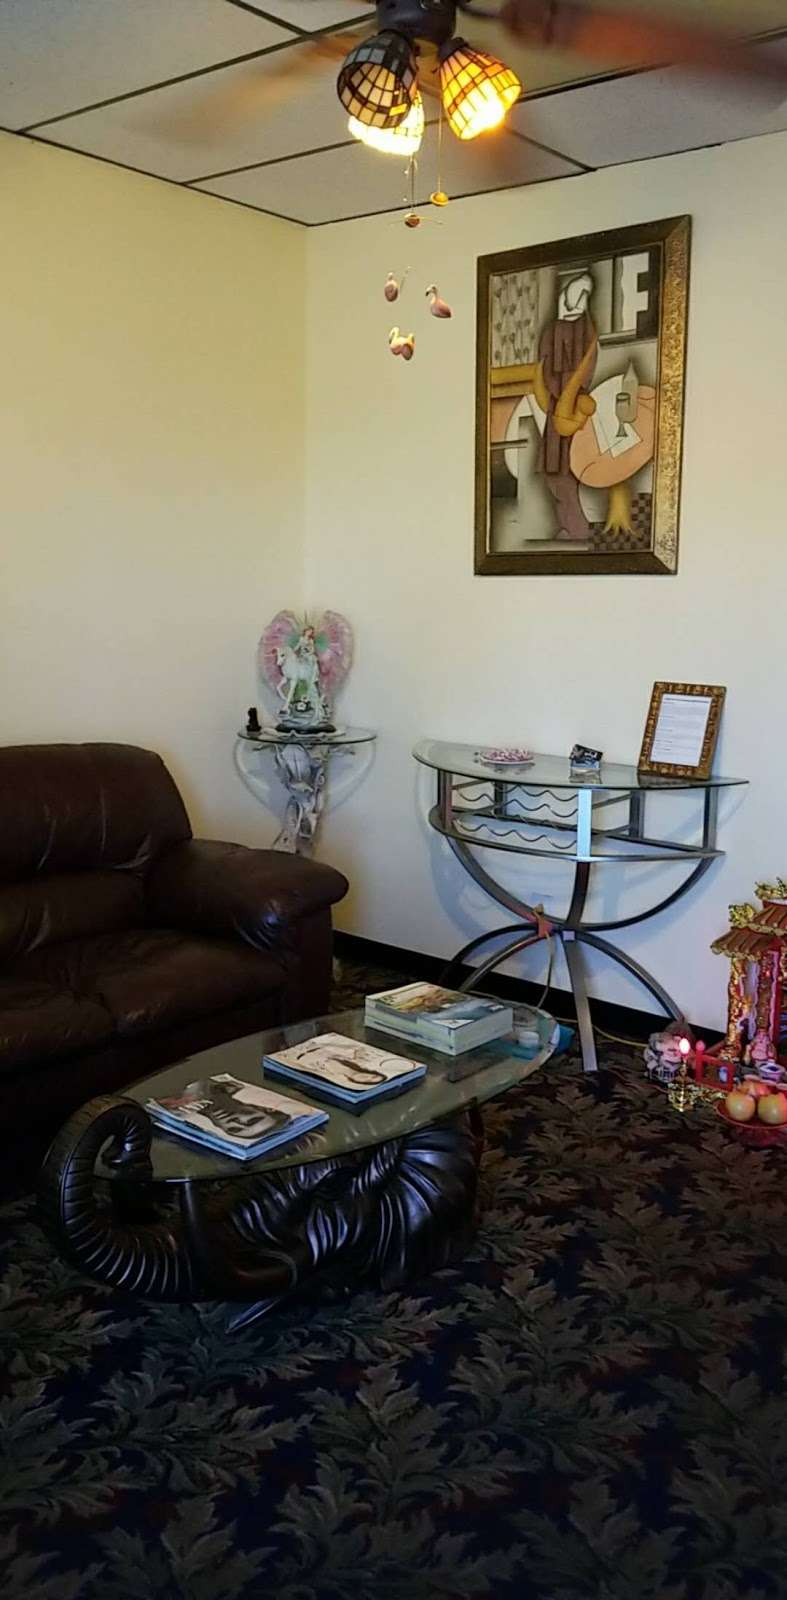 Asian Massage Flamingo Spa - spa  | Photo 2 of 10 | Address: 4935 W Glendale Ave #5, Glendale, AZ 85301, USA | Phone: (623) 931-6076